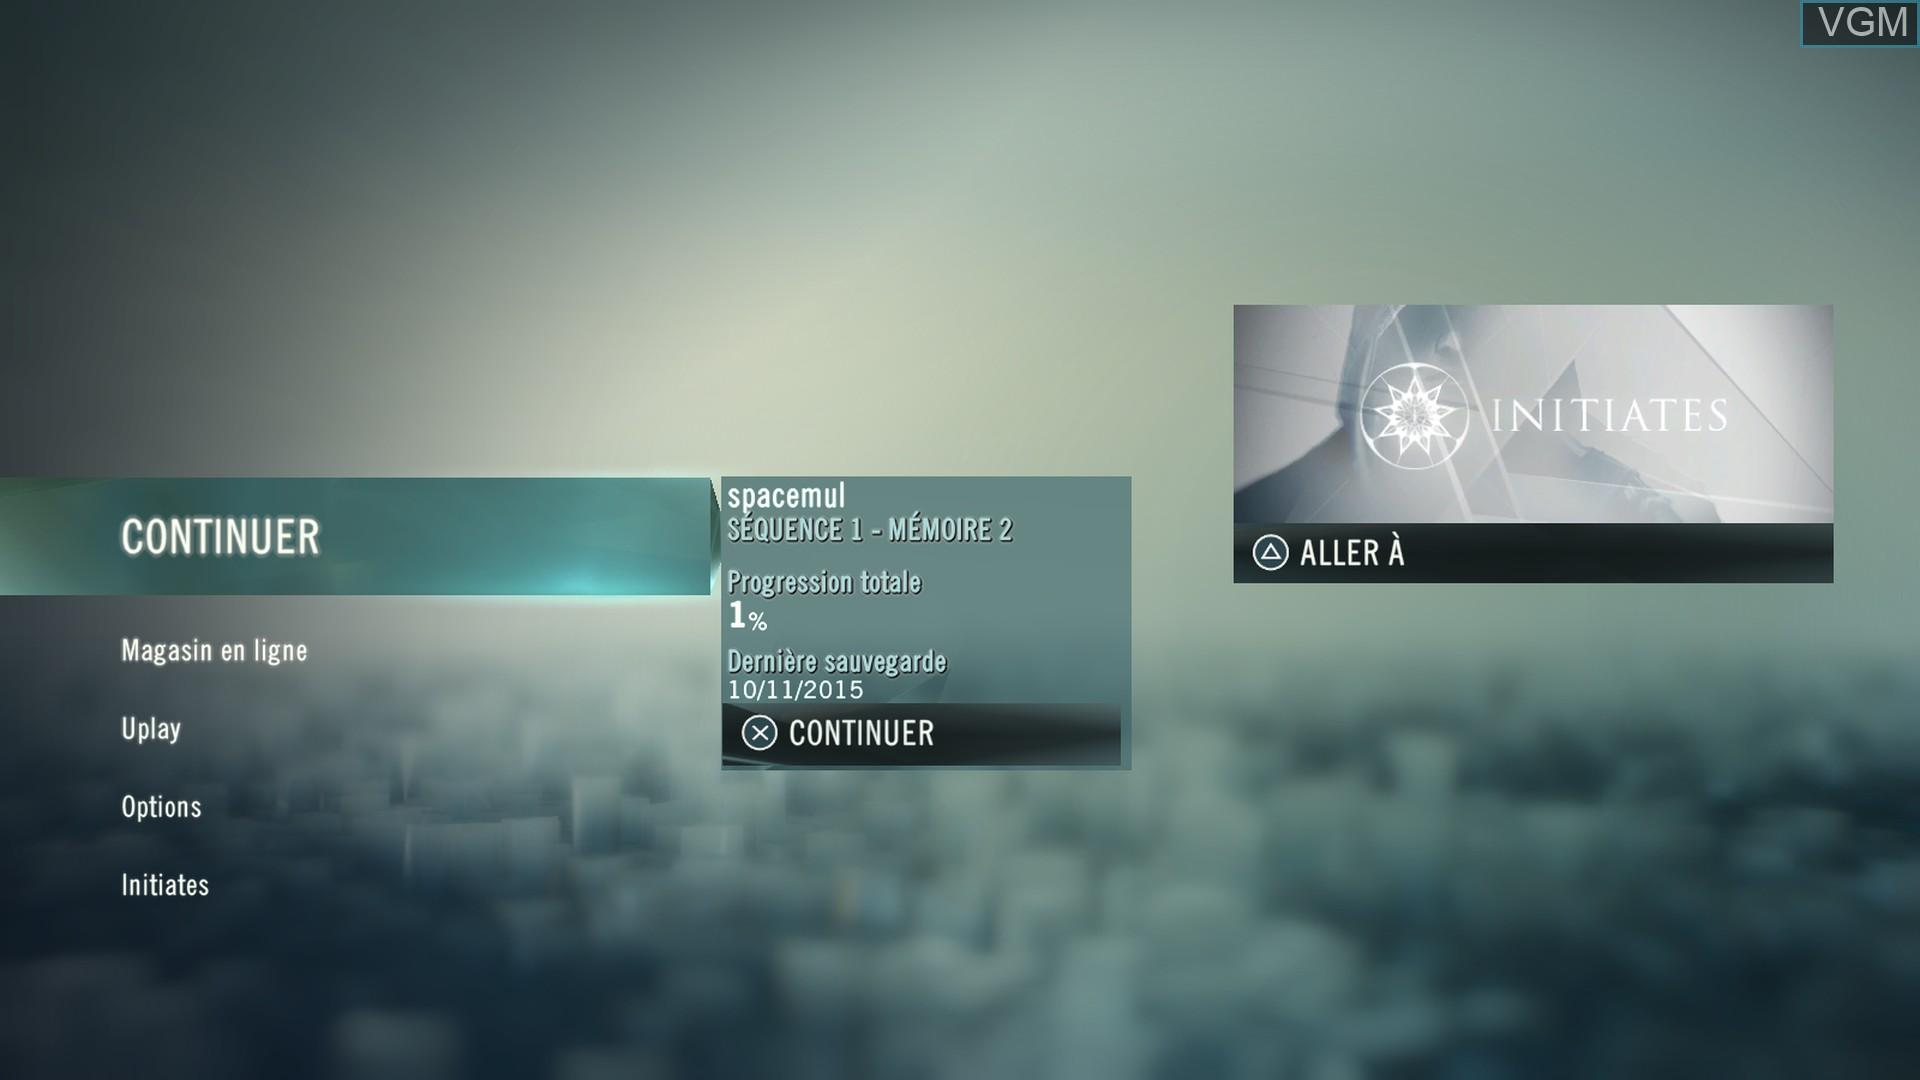 Image du menu du jeu Assassin's Creed Unity sur Sony Playstation 4